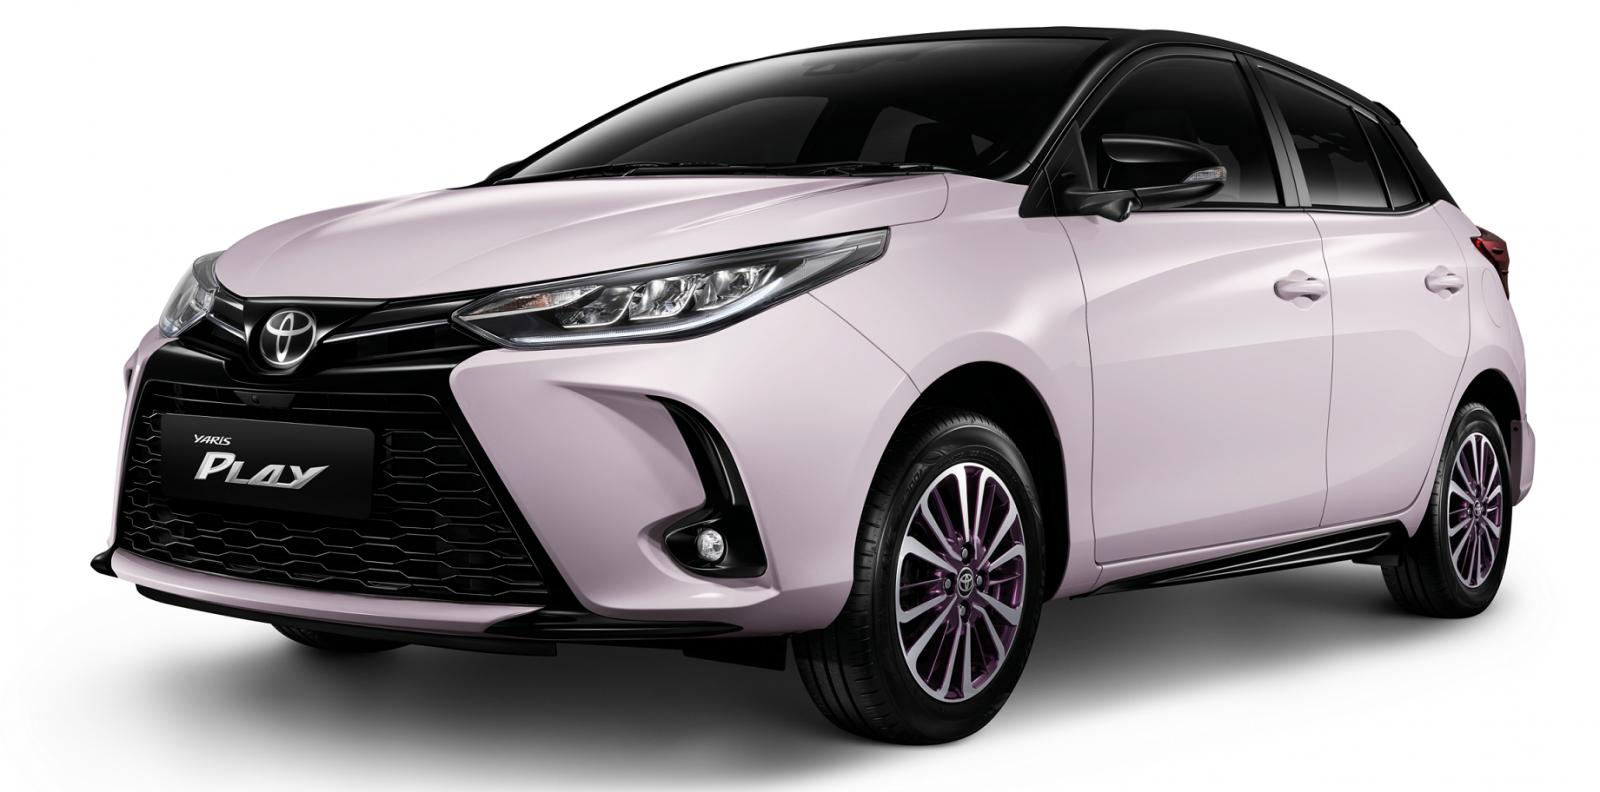 2021 Toyota Yaris PLAY